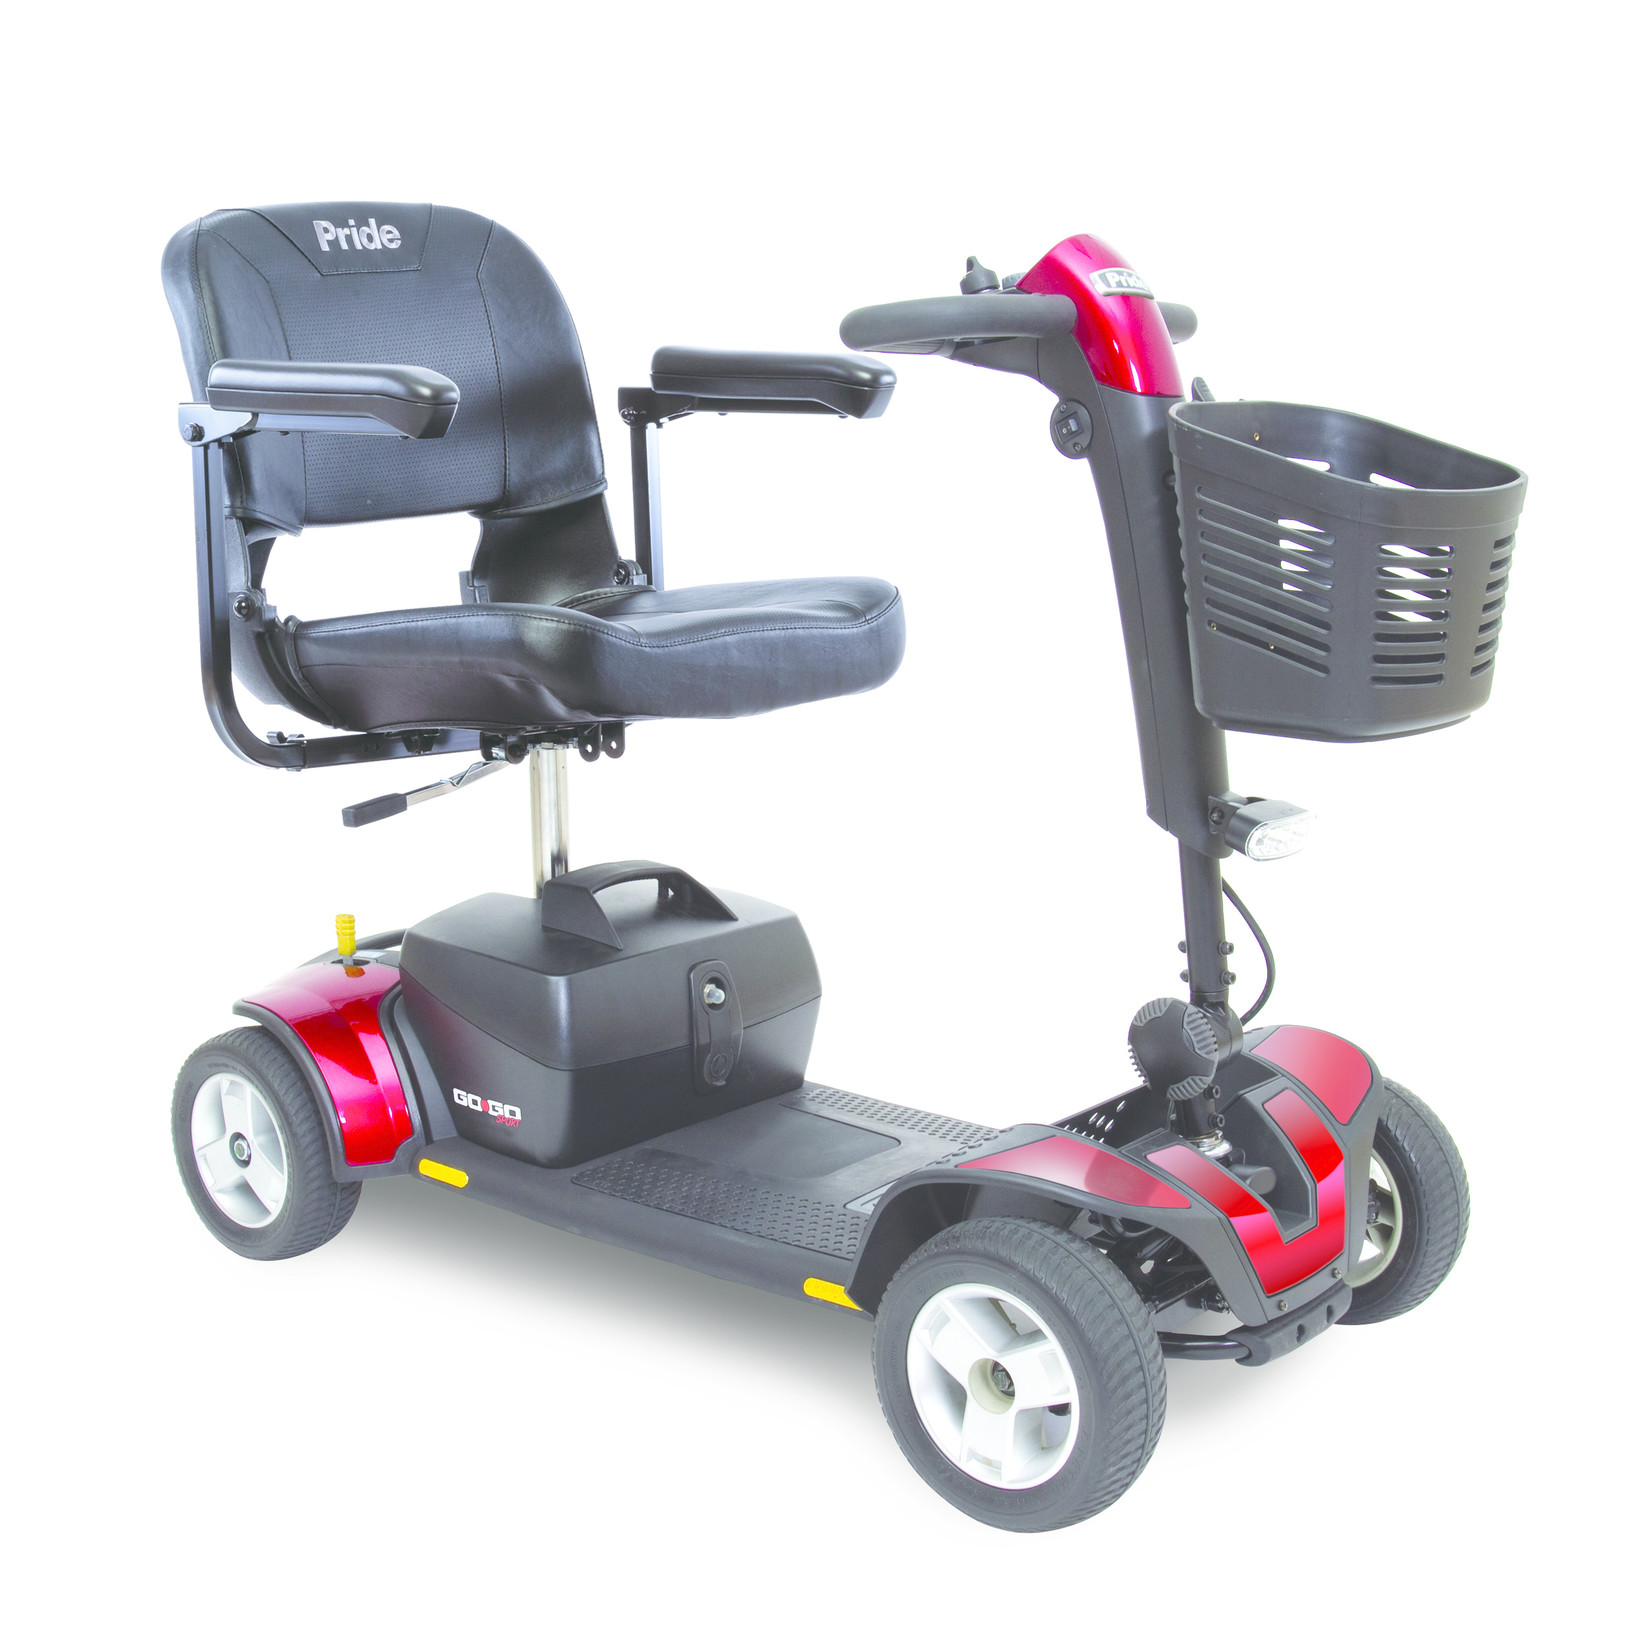 Pride Go-Go Sport 4-Wheel Scooter